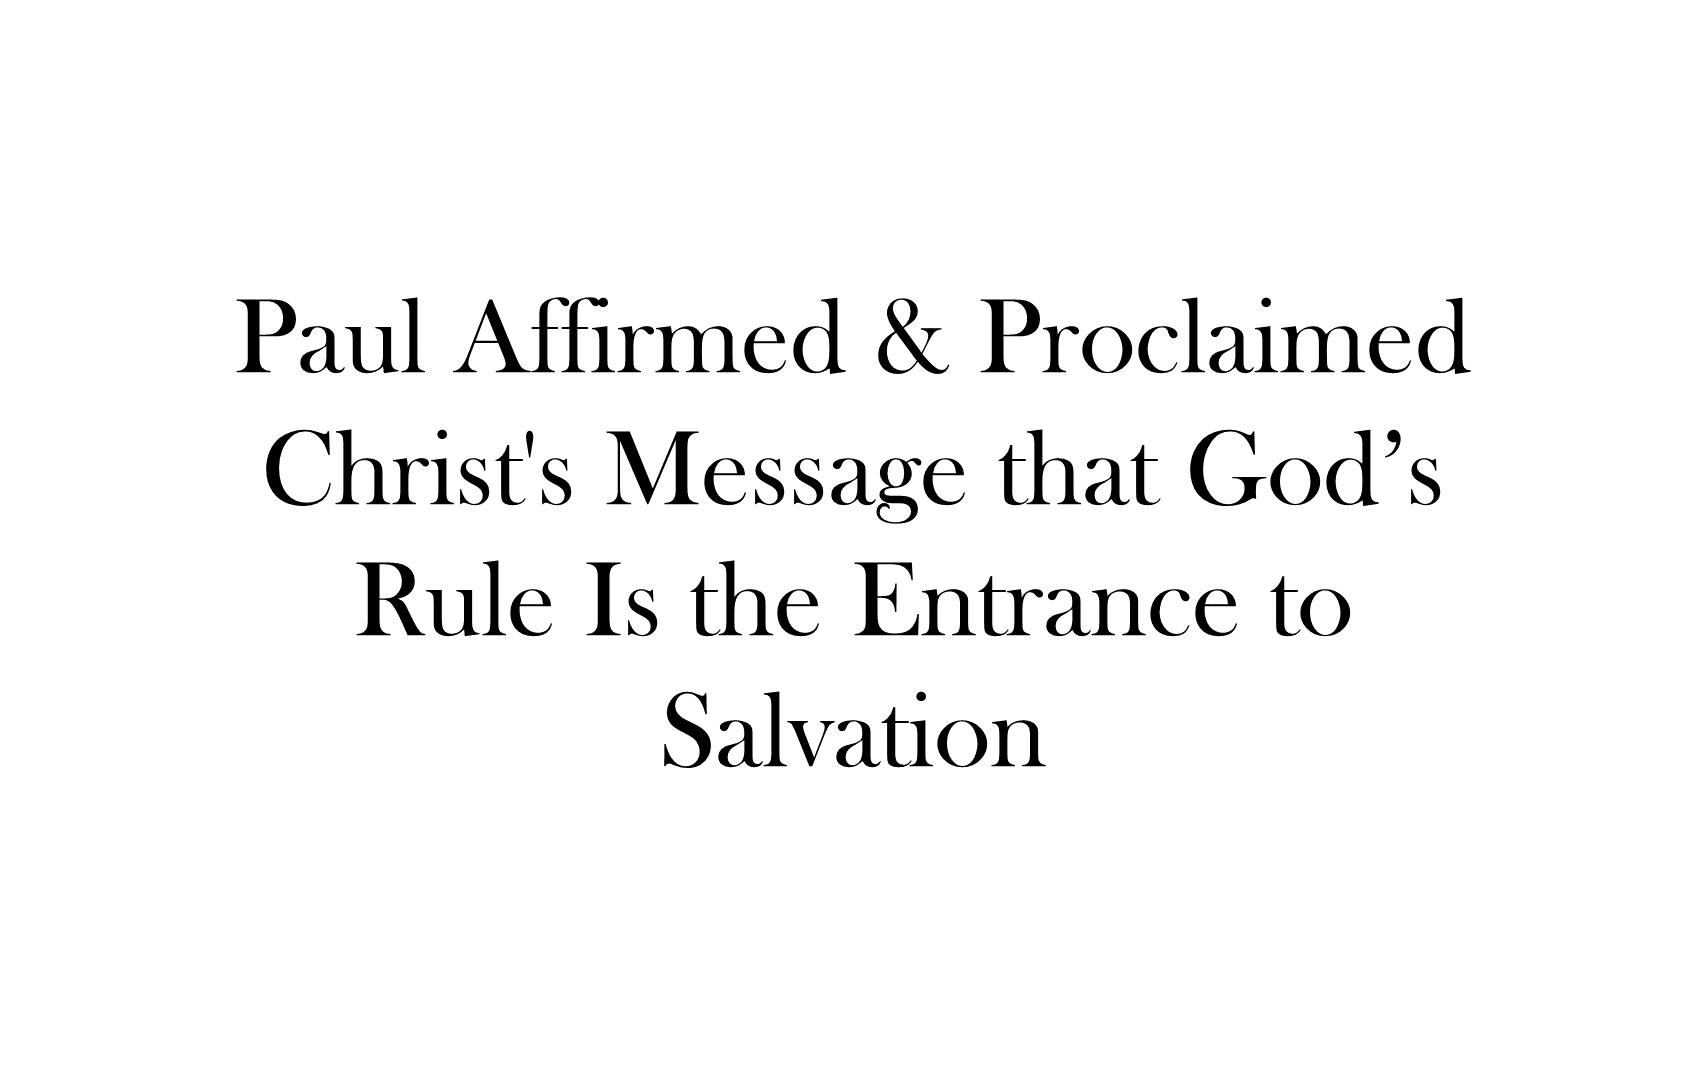 ESH-20 - The Discipline Of Disciple-Making - Seeing, Understanding, Entering, Living, & Seeking The Kingdom Of God ( (19)